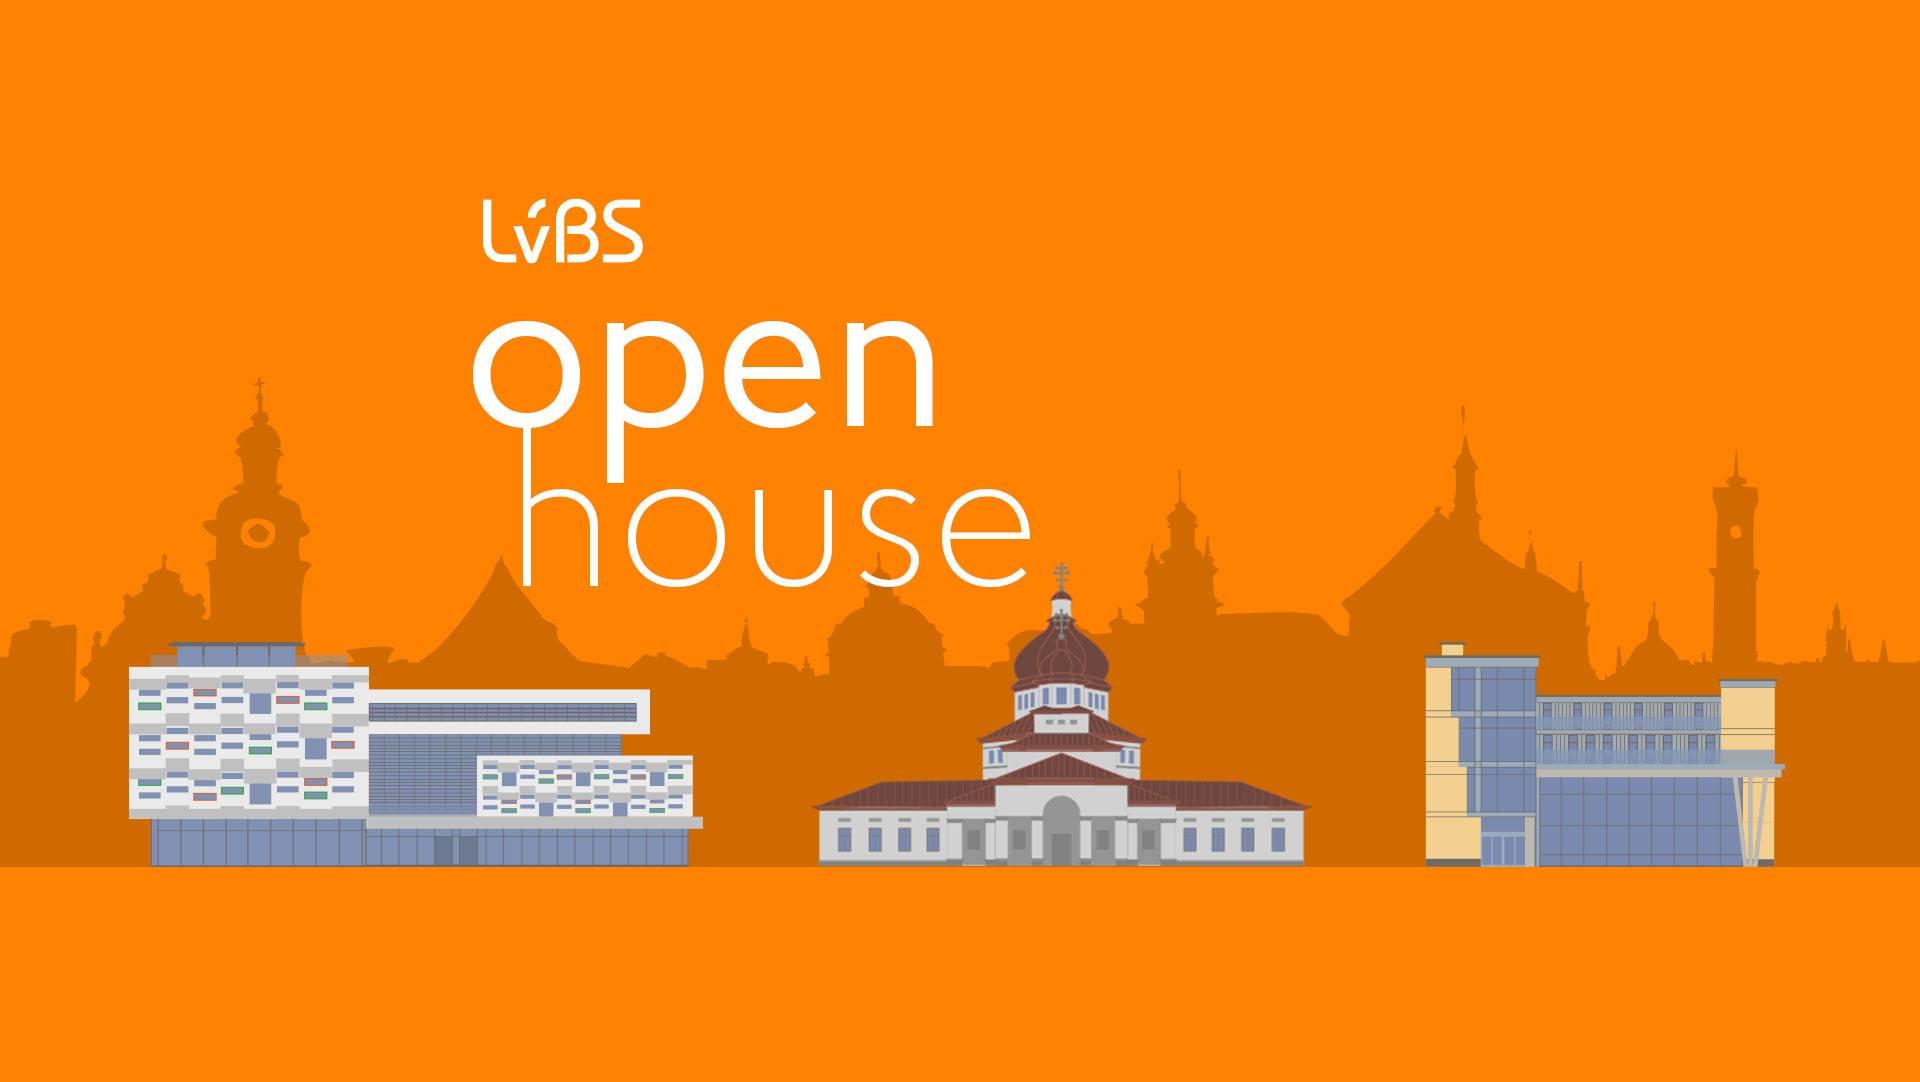 LvBS Open House: Бізнес-освіта 2019 – це Твій час!